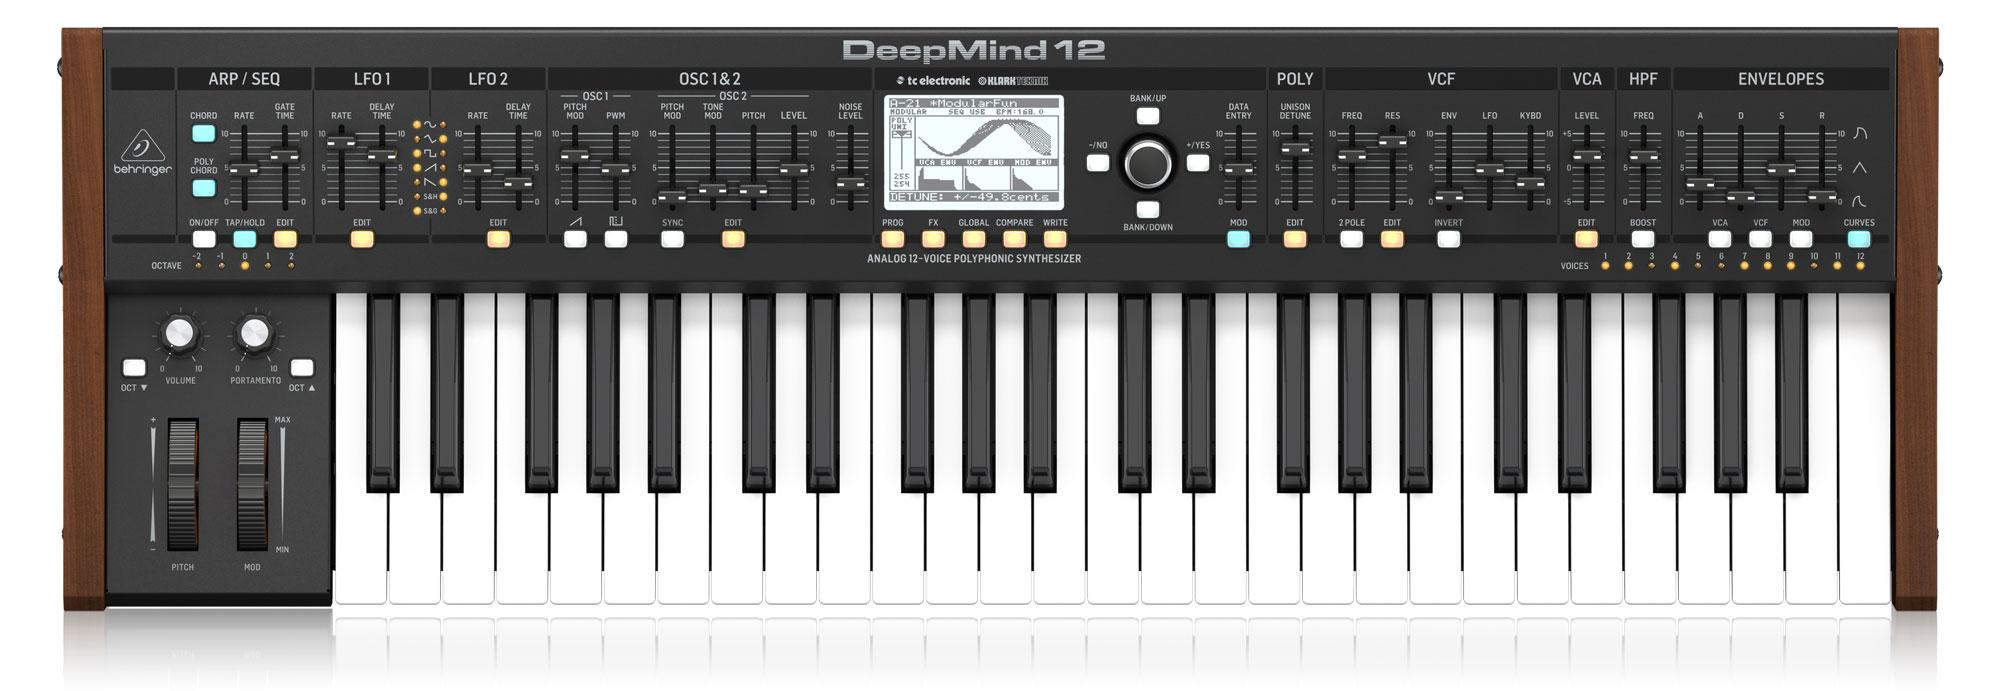 Synthesizer - Behringer DeepMind 12 Analog Synthesizer - Onlineshop Musikhaus Kirstein